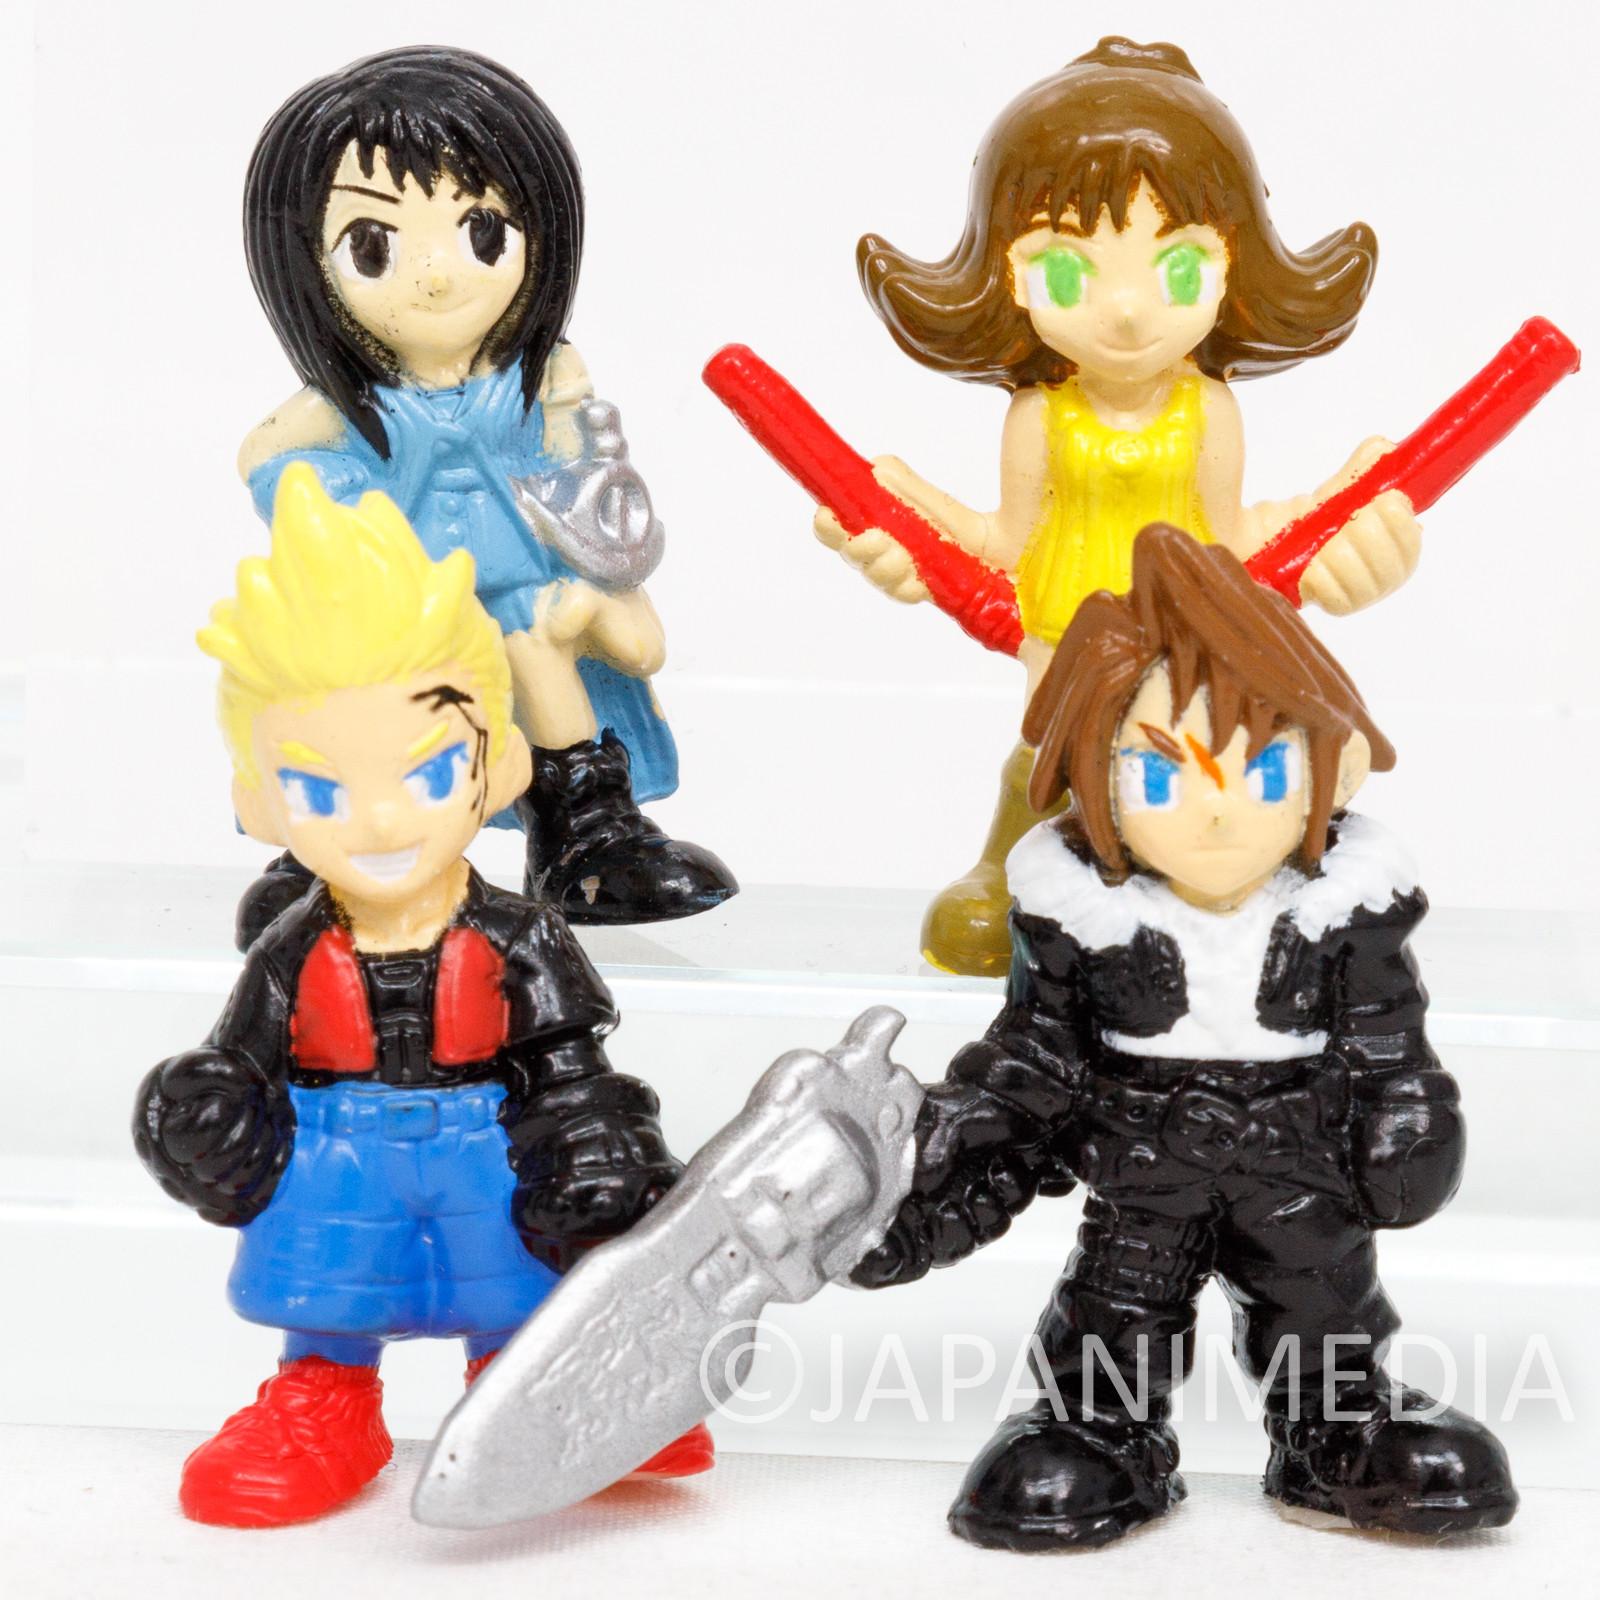 Final Fantasy VIII Squall Rinoa Selphie Zell Miniature Figure Set SQUARE ENIX